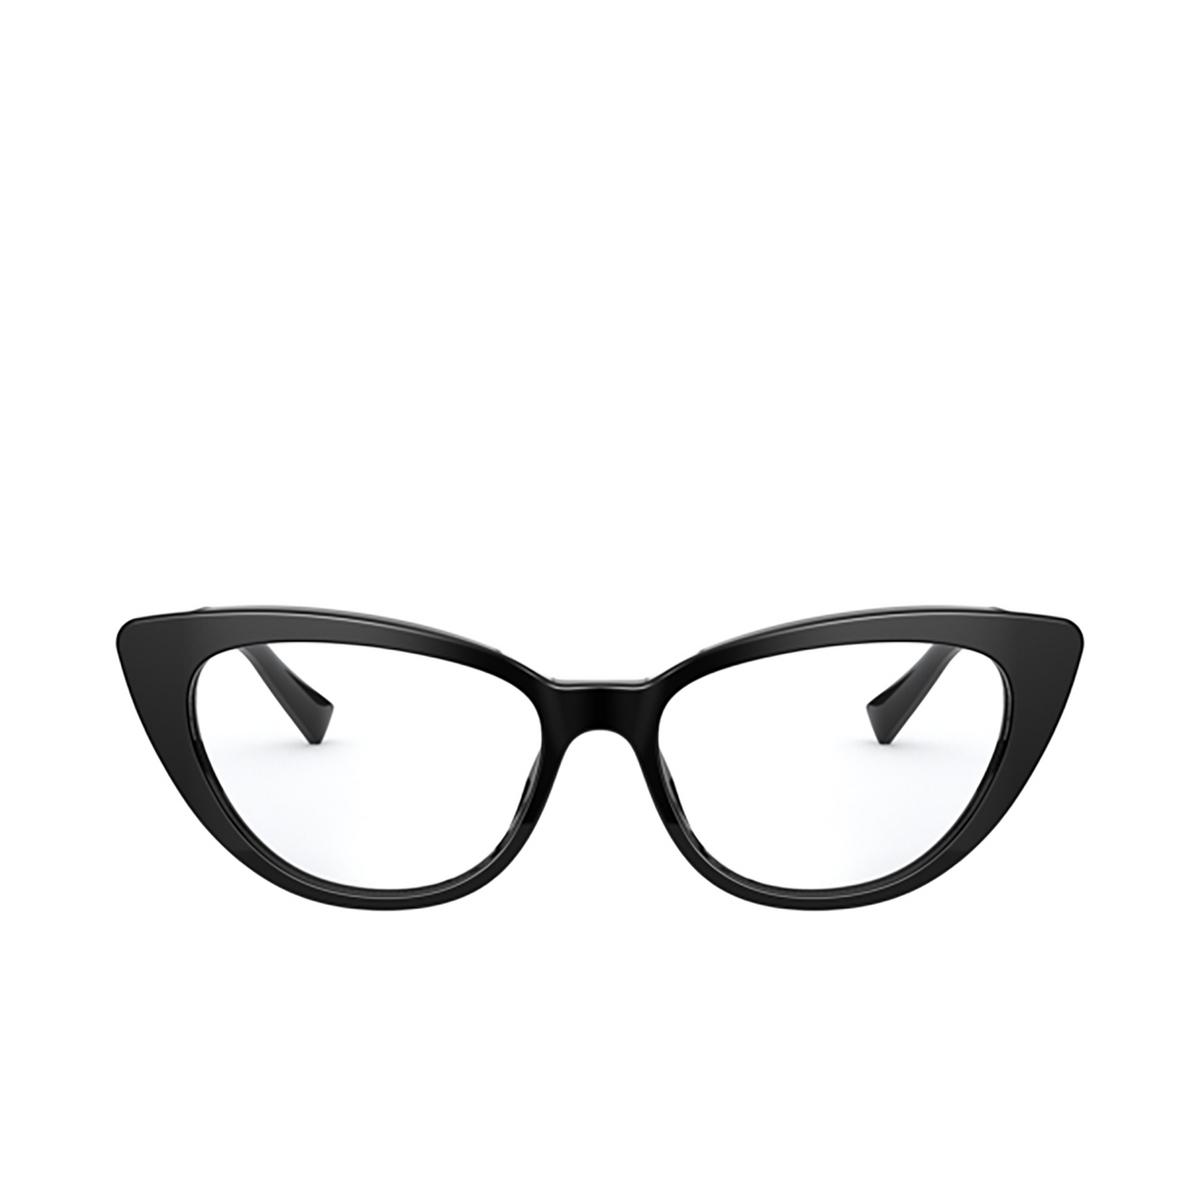 Versace® Cat-eye Eyeglasses: VE3286 color Black GB1 - front view.